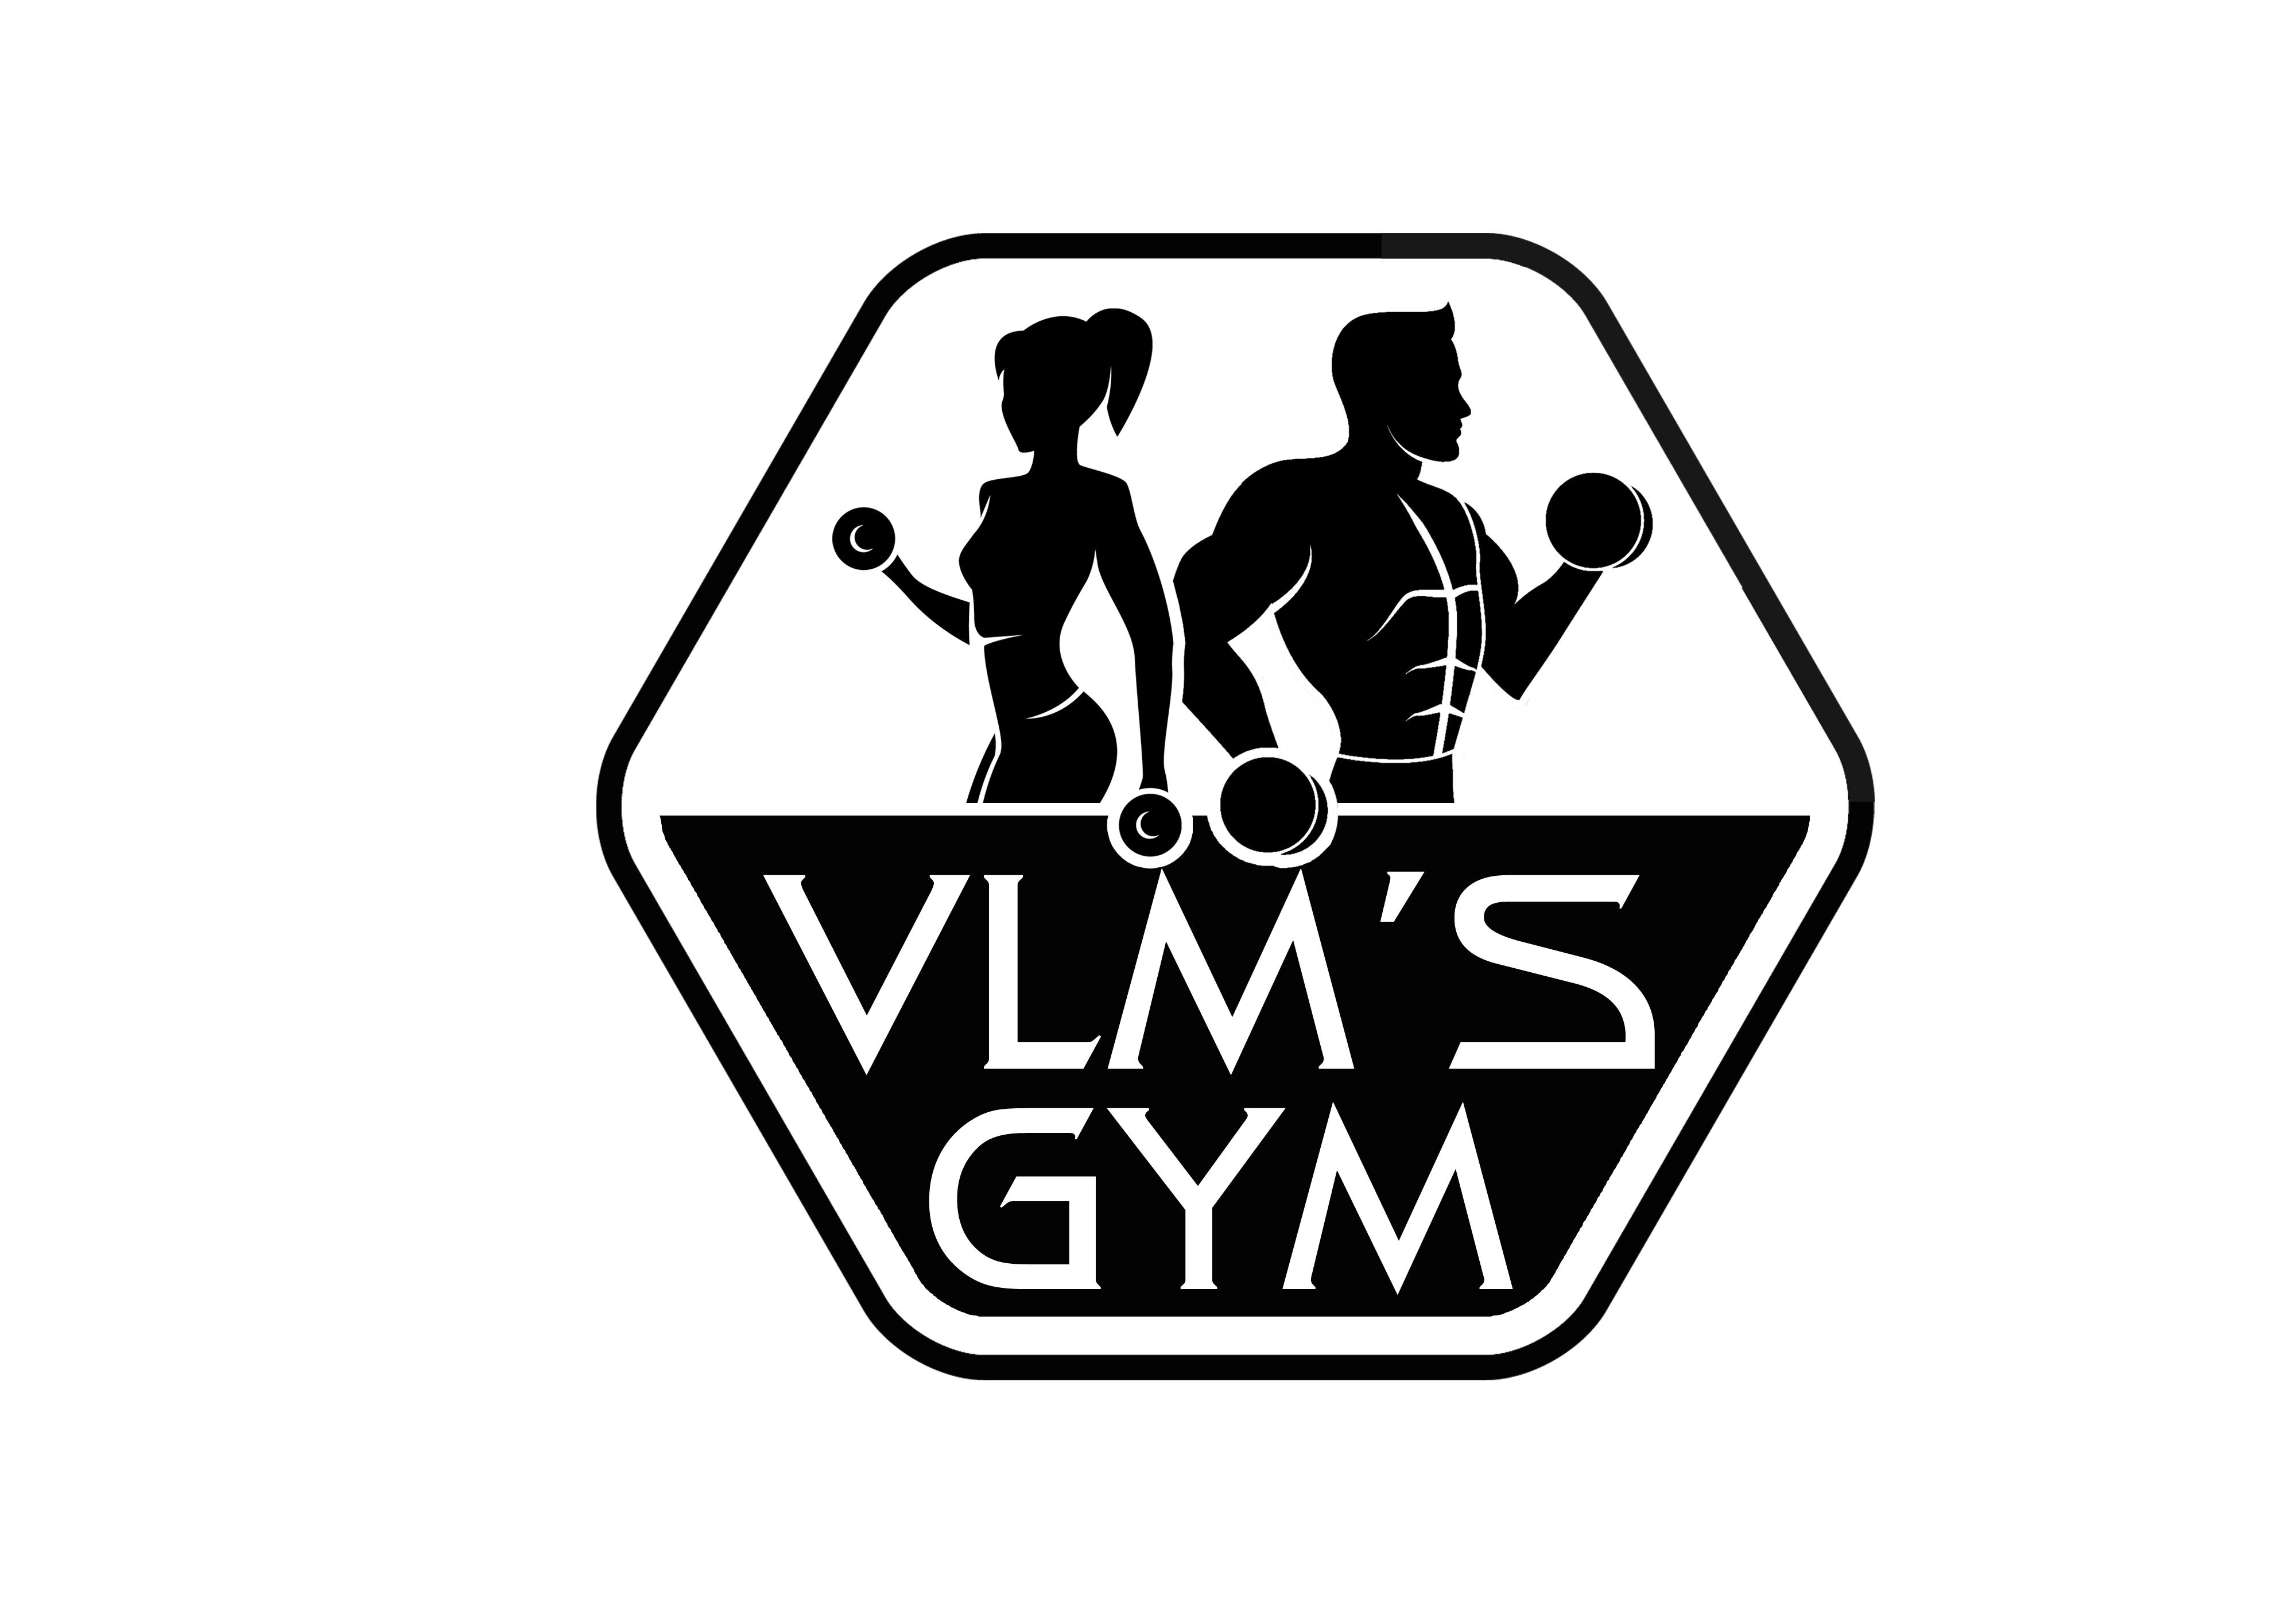 VLM`S GYM - Fitness & GYM